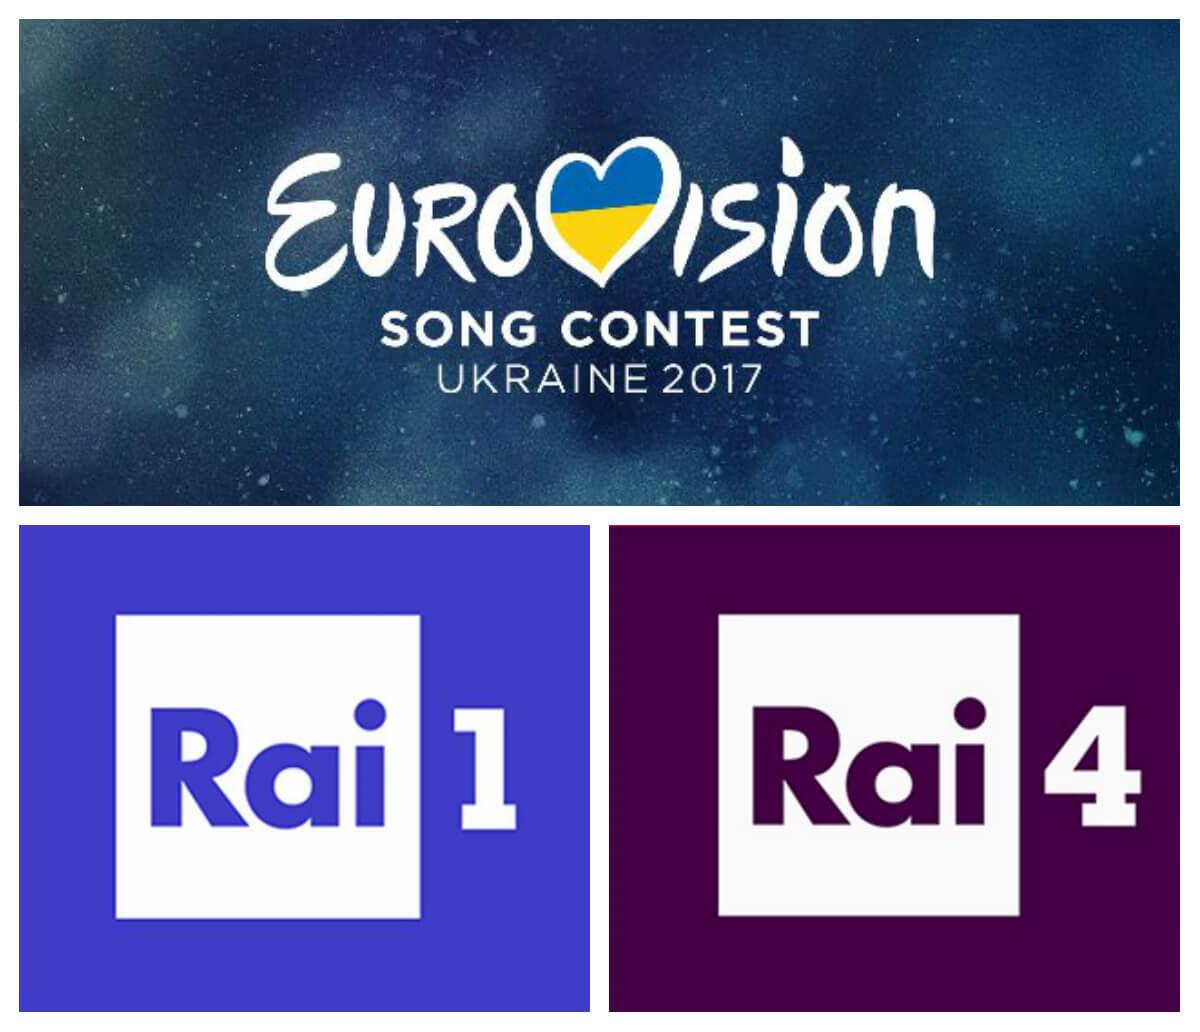 Eurovision Rai 2016